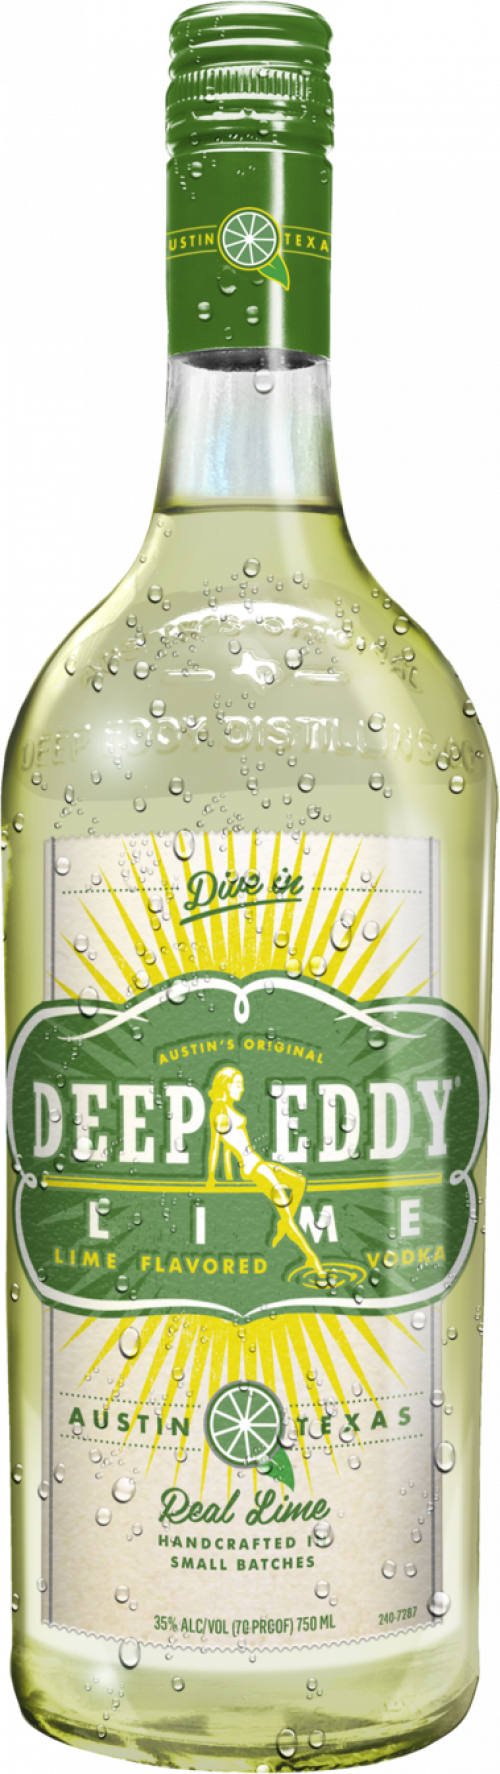 Deep Eddy Lime Flavored Vodka 1L